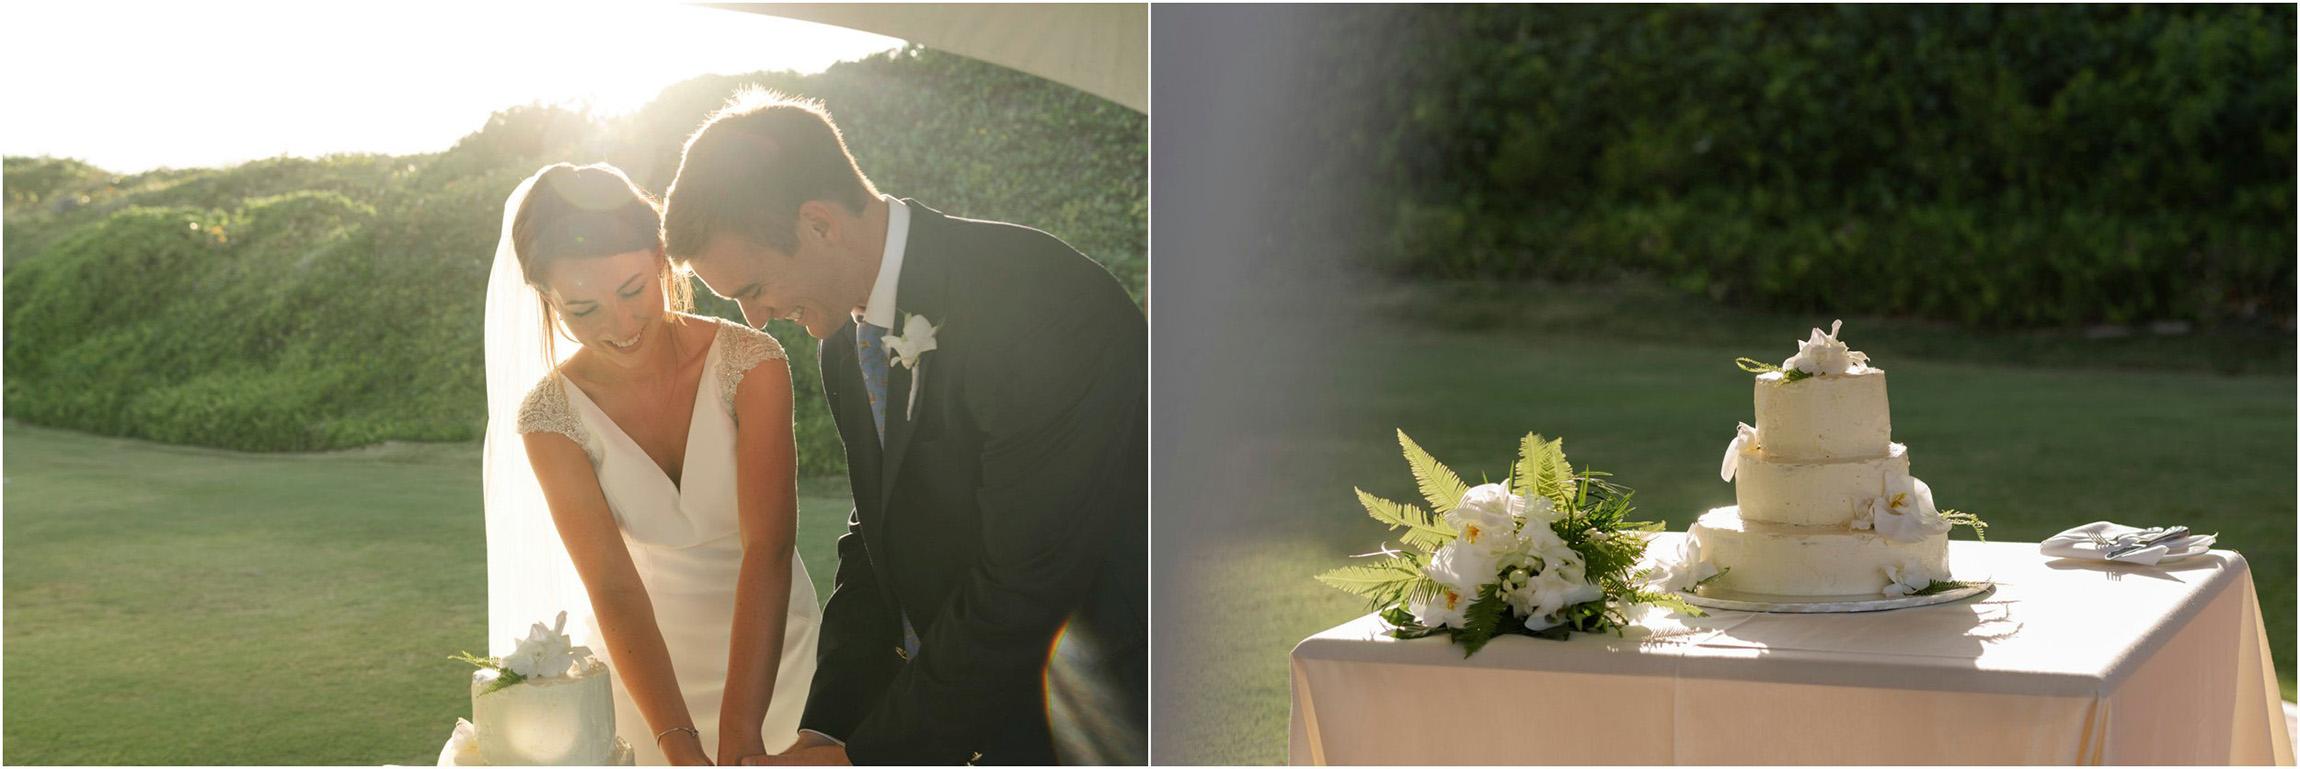 ©FianderFoto_Bermuda Wedding Photographer_Mid Ocean_Rachel_Angus_096.jpg